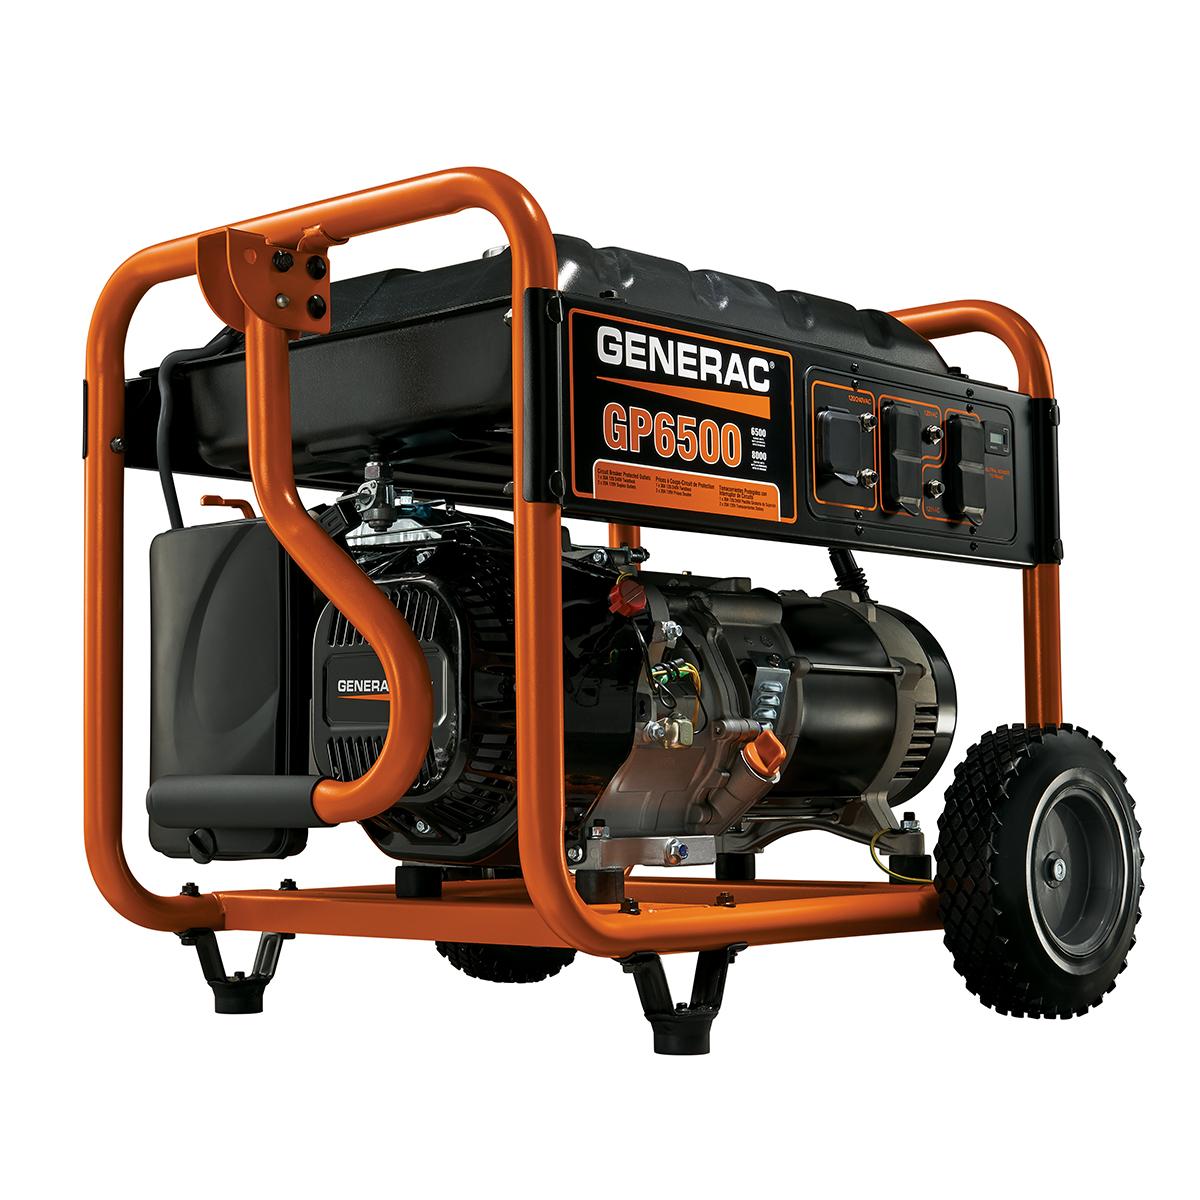 5946 - 6500 Watt Portable Generator, CARB